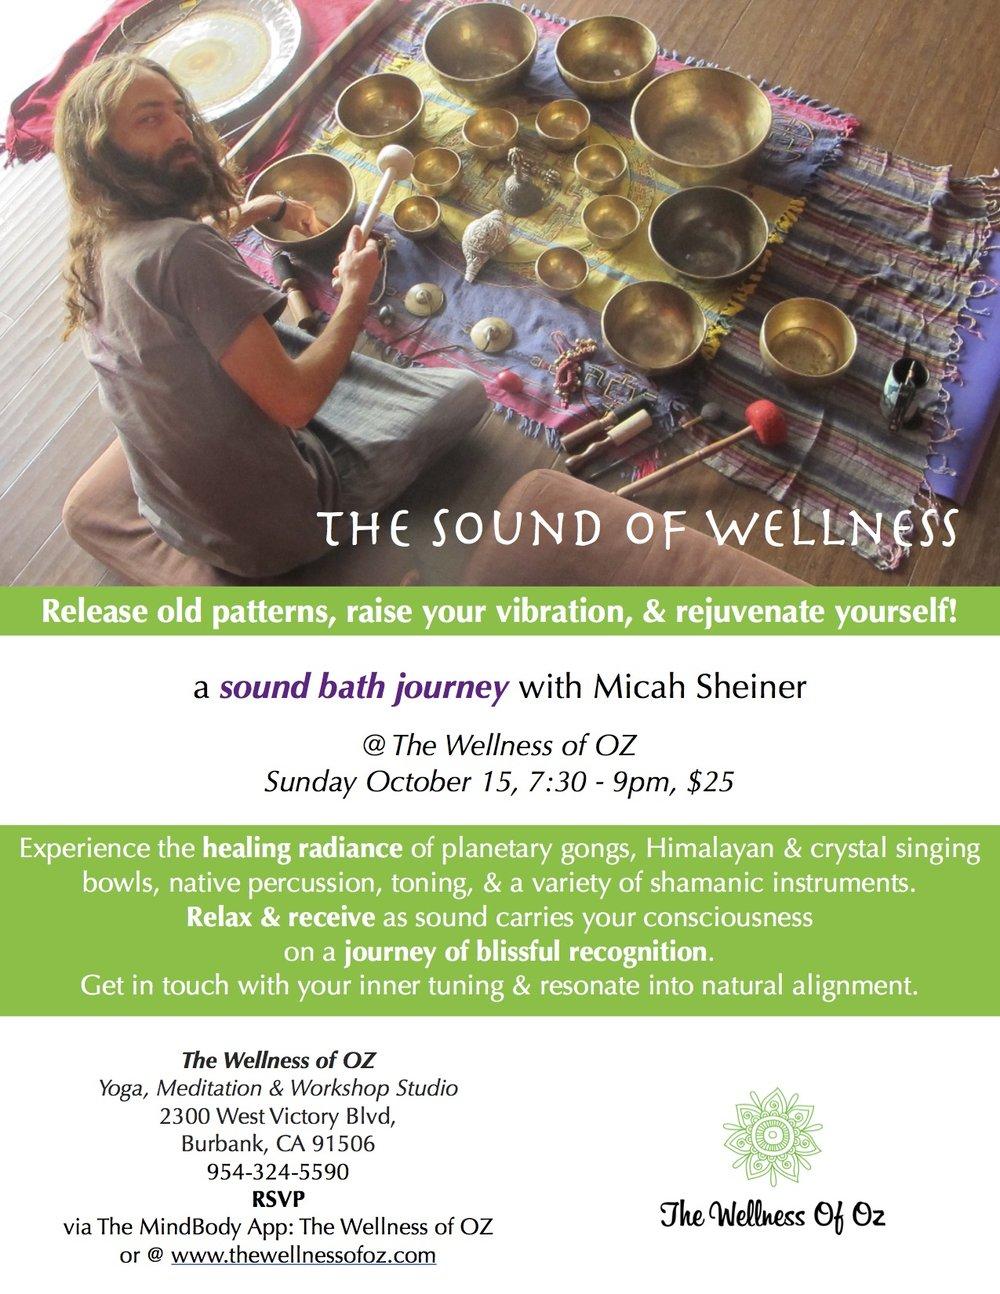 The sound of wellness october 15.jpg